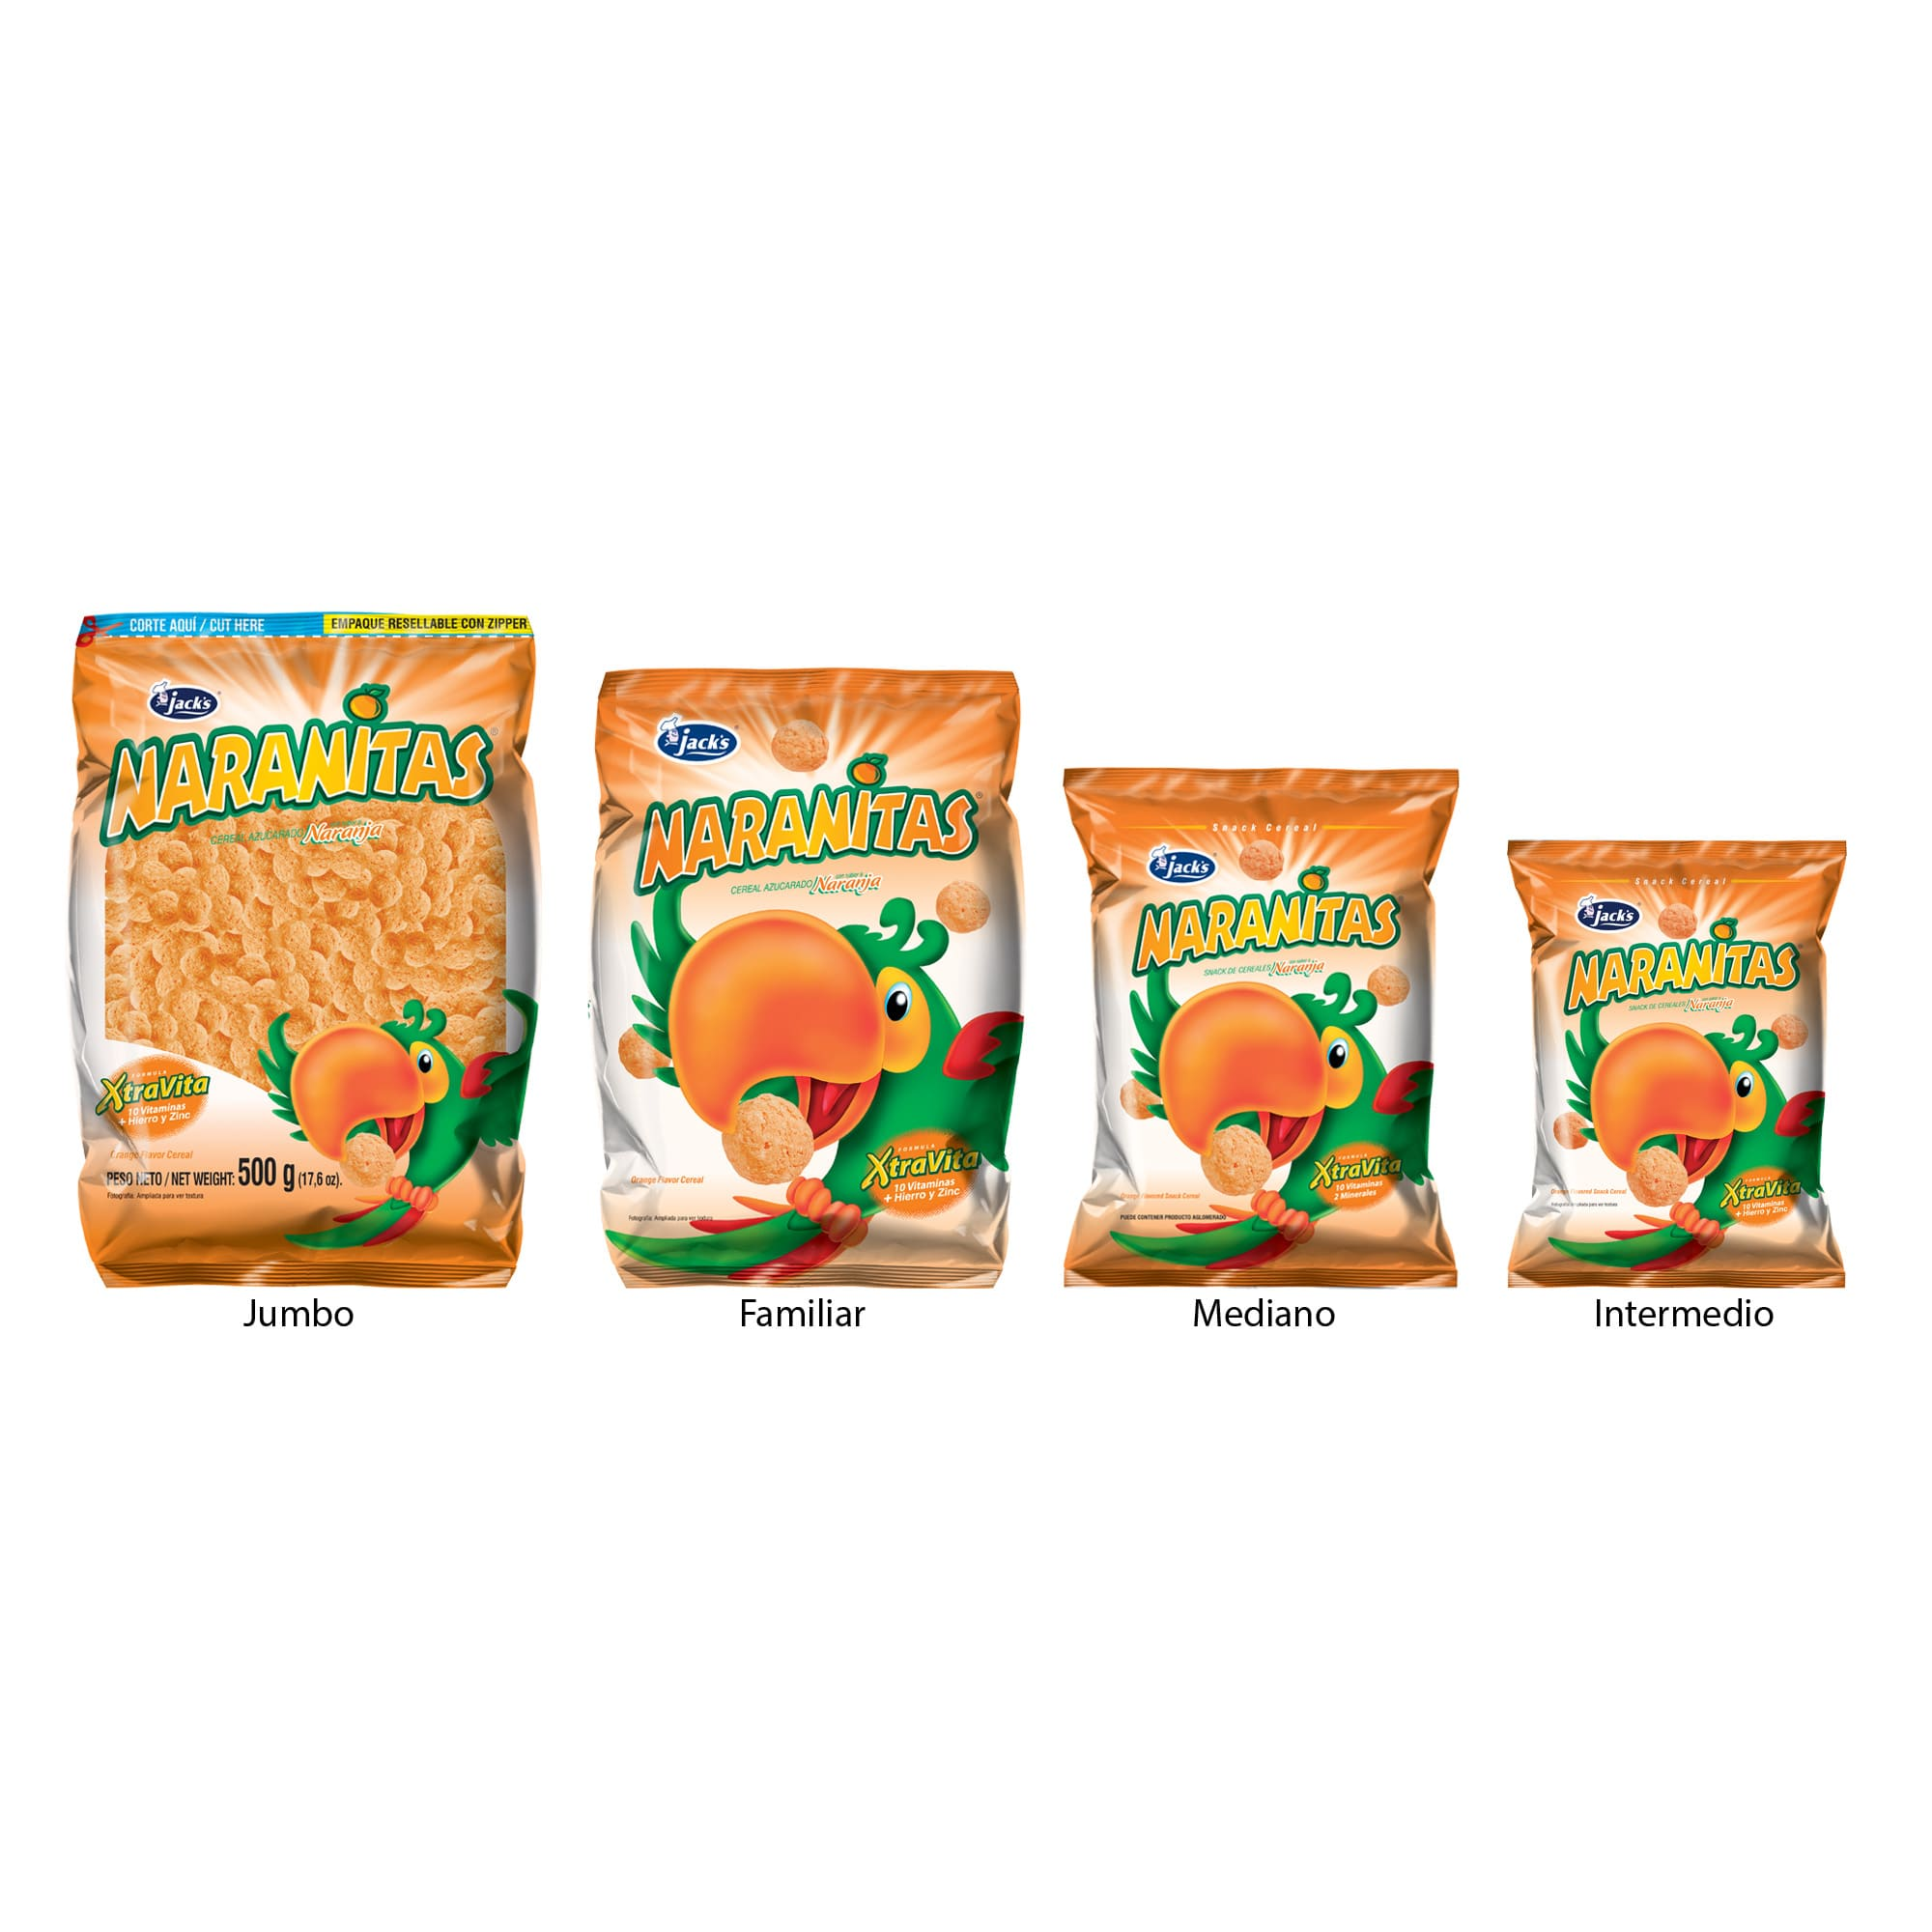 NARANITAS cereales presentac pag web